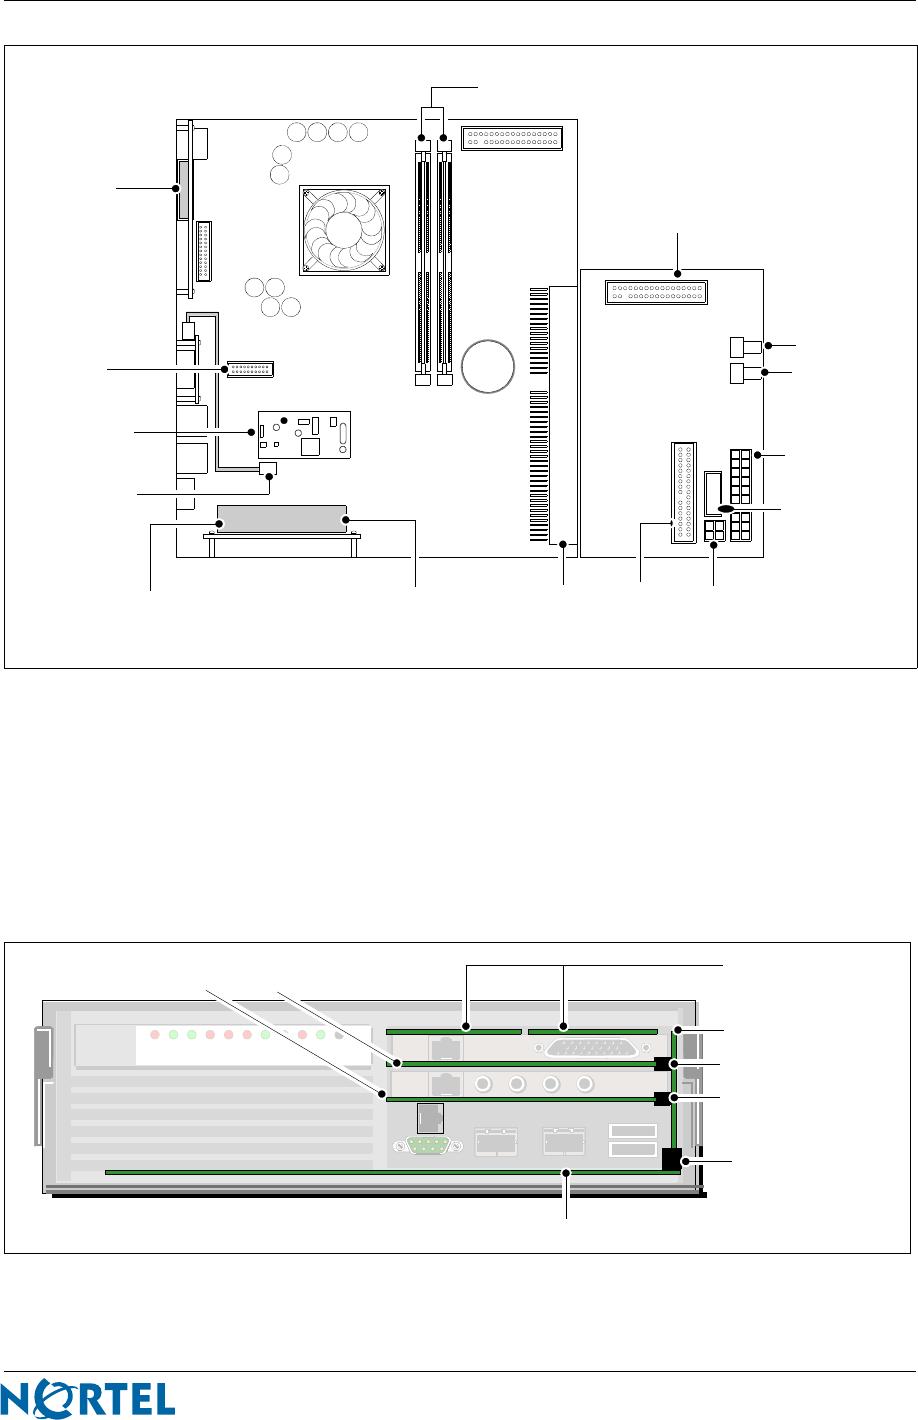 Avaya Business Communication Manager Bcm200 400 4 0 Installation And Wiringpi Docu Chapter 2 47